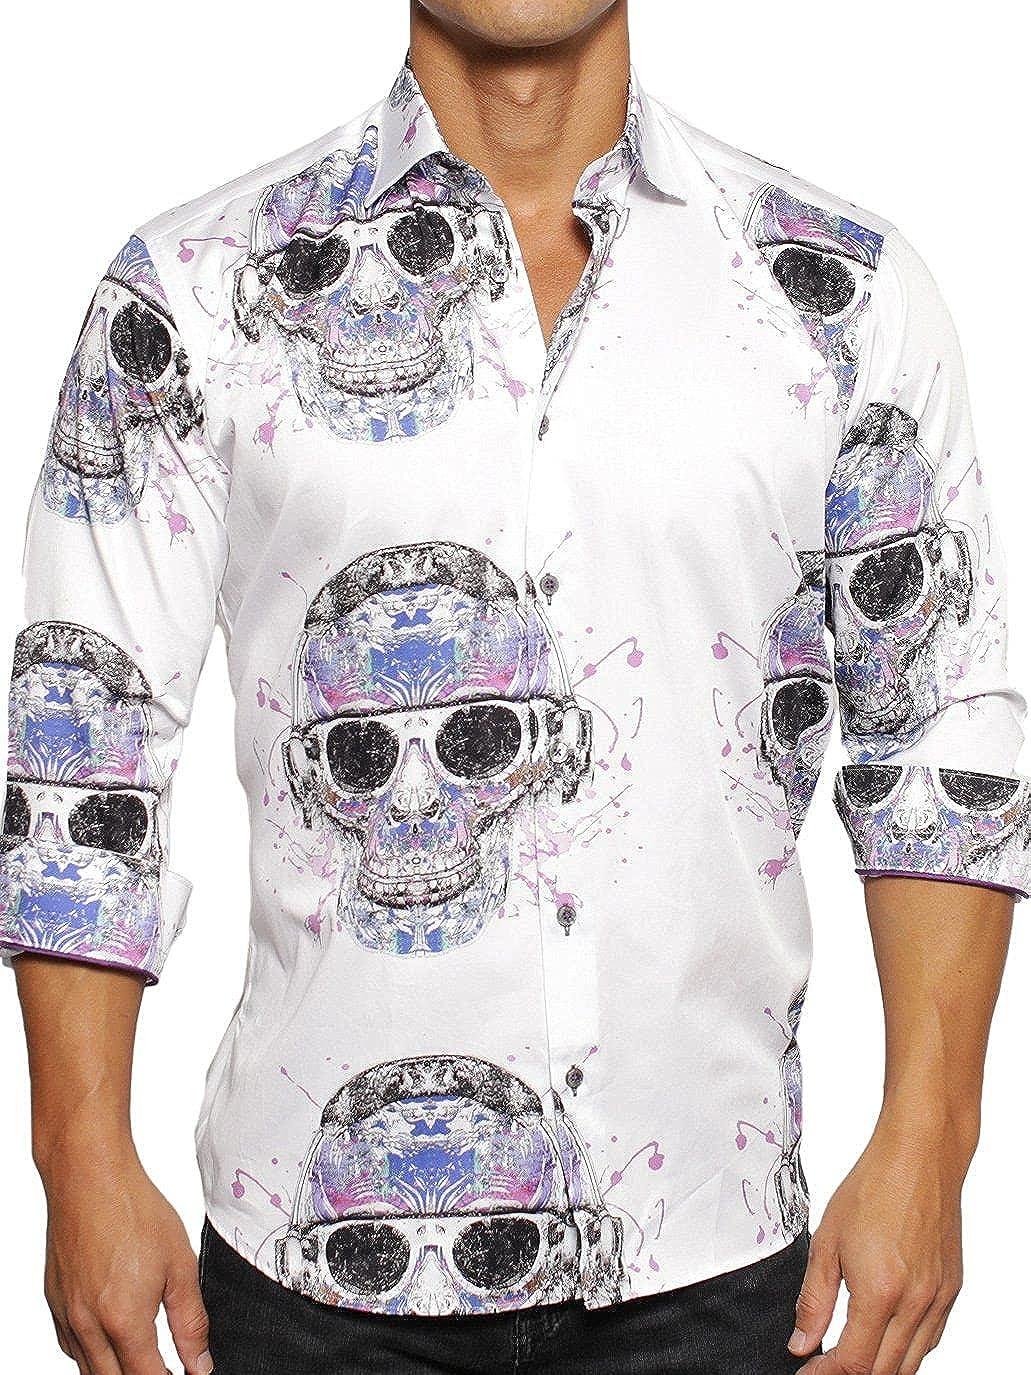 Maceoo Mens Designer Dress Shirt LS - Stylish & Trendy - Fibonacci Skull Nuts White - Shaped Fit